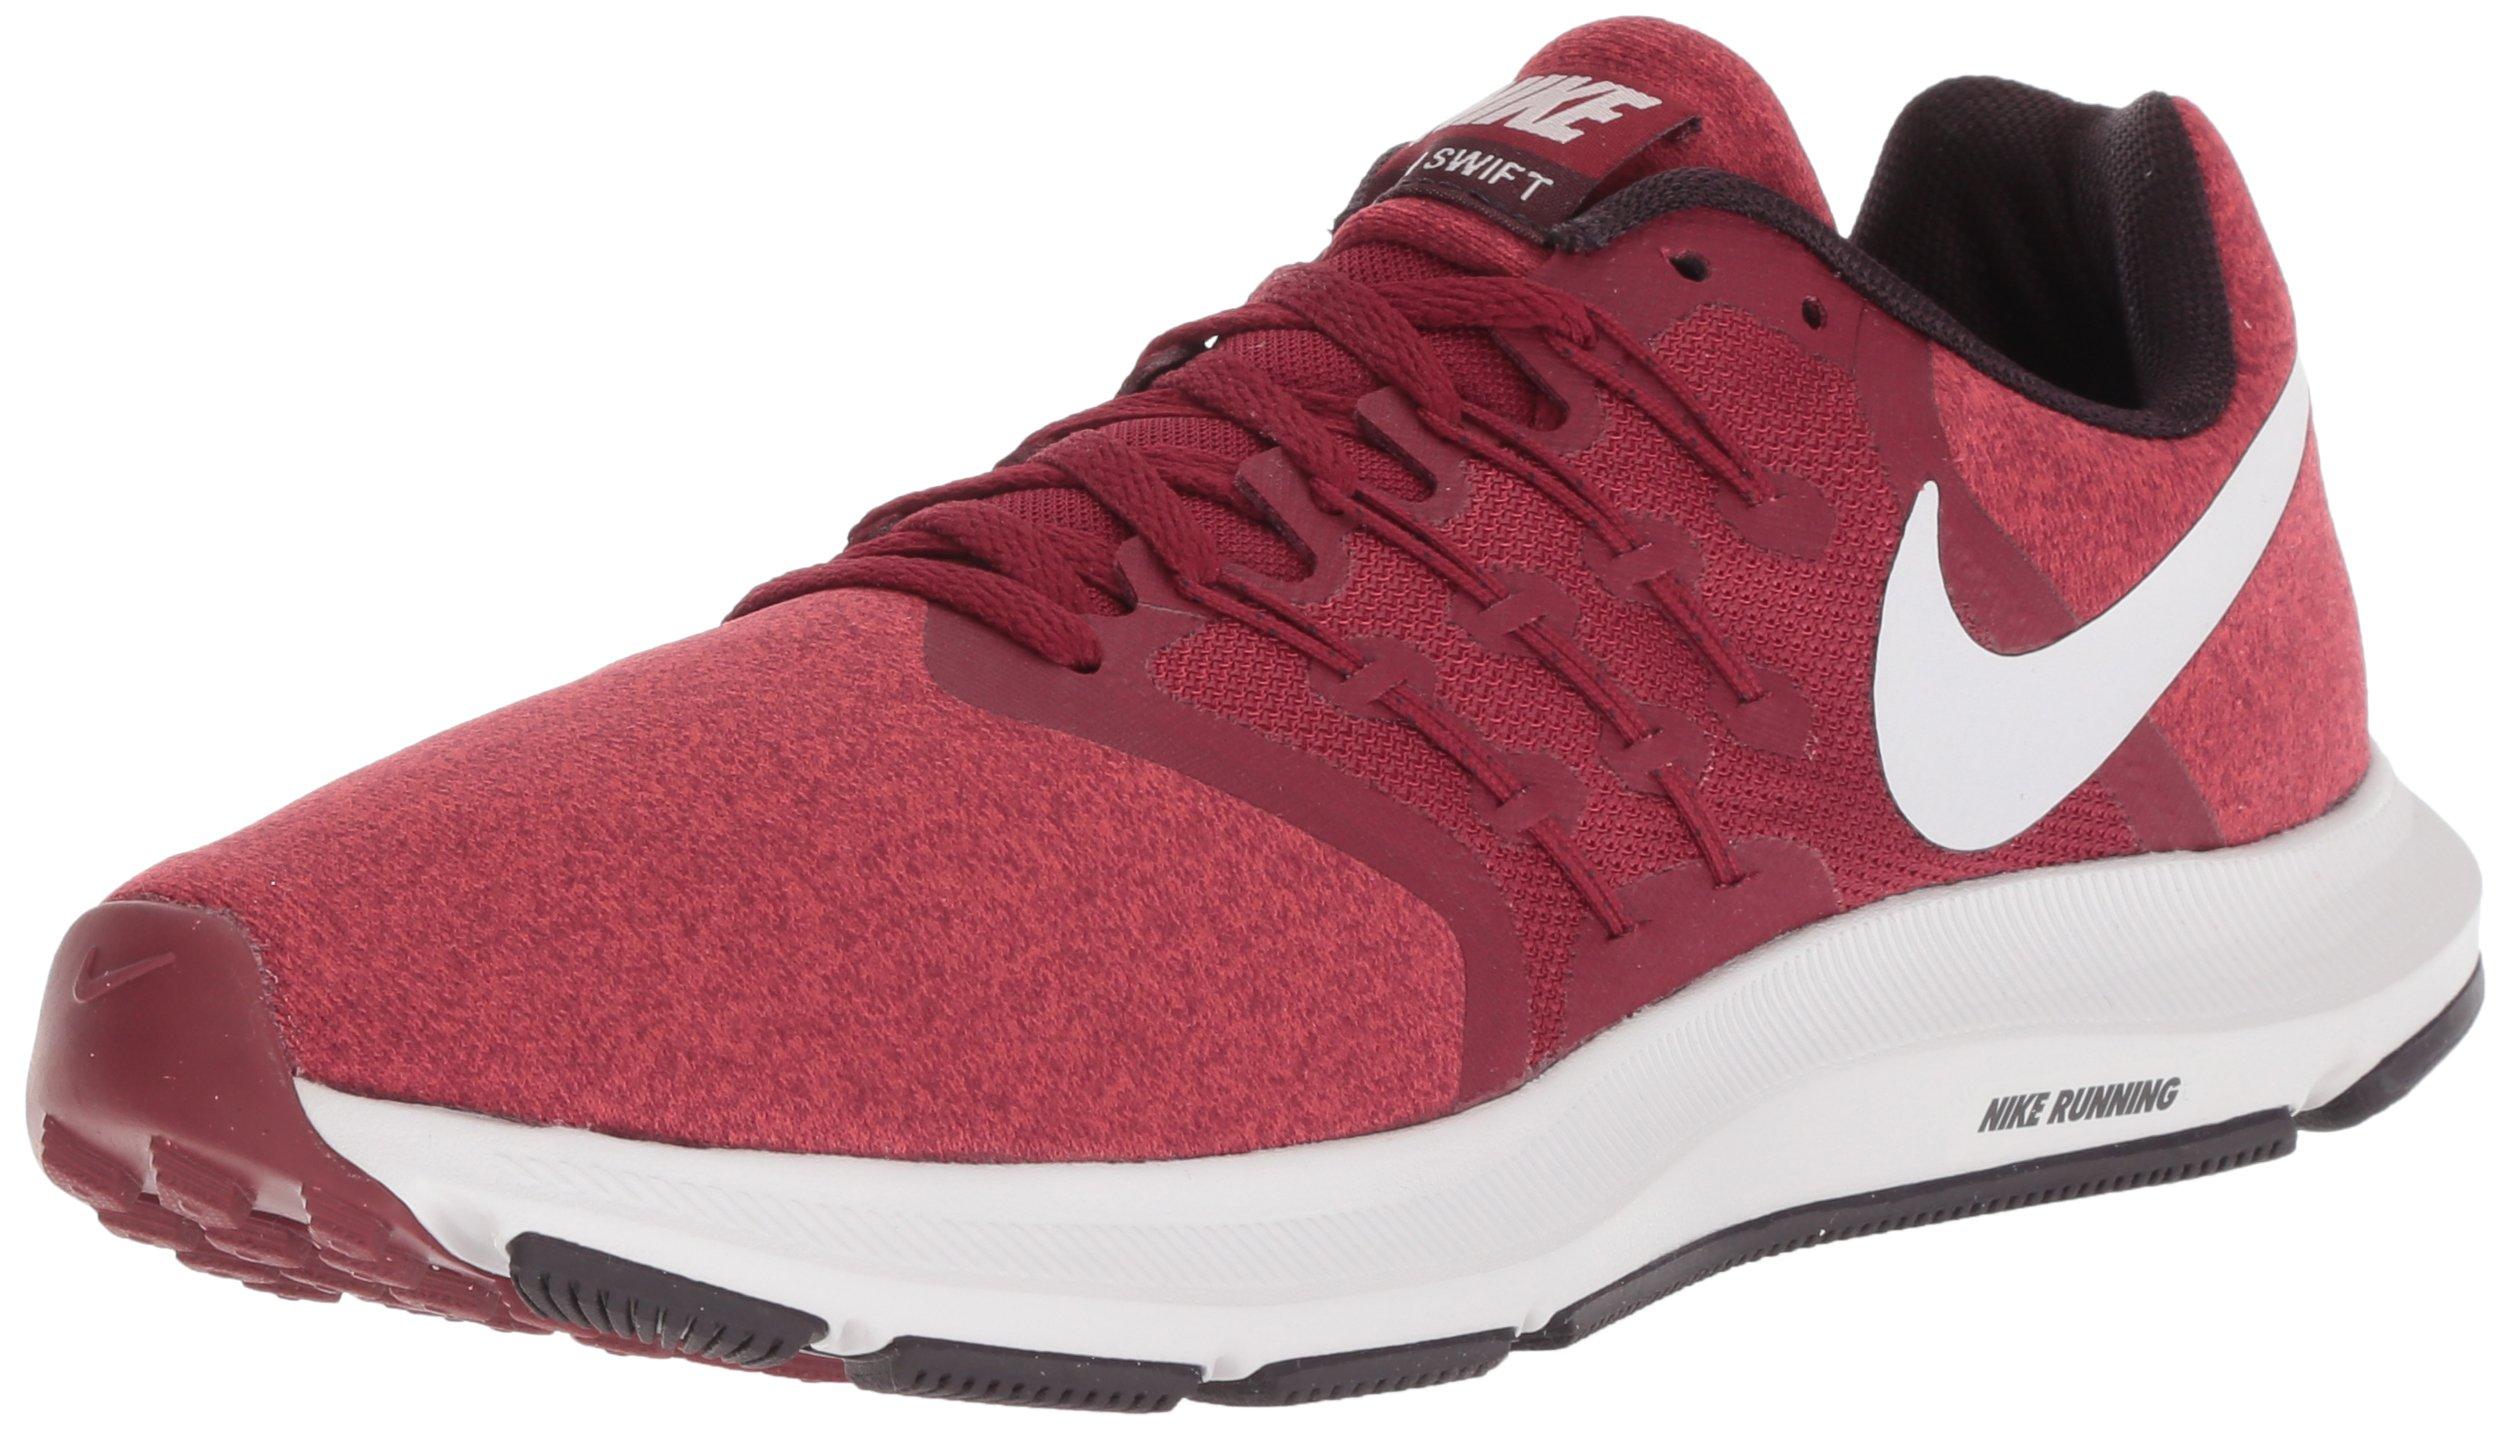 d81fbbad6f83 Galleon - Nike Men s Run Swift Shoe